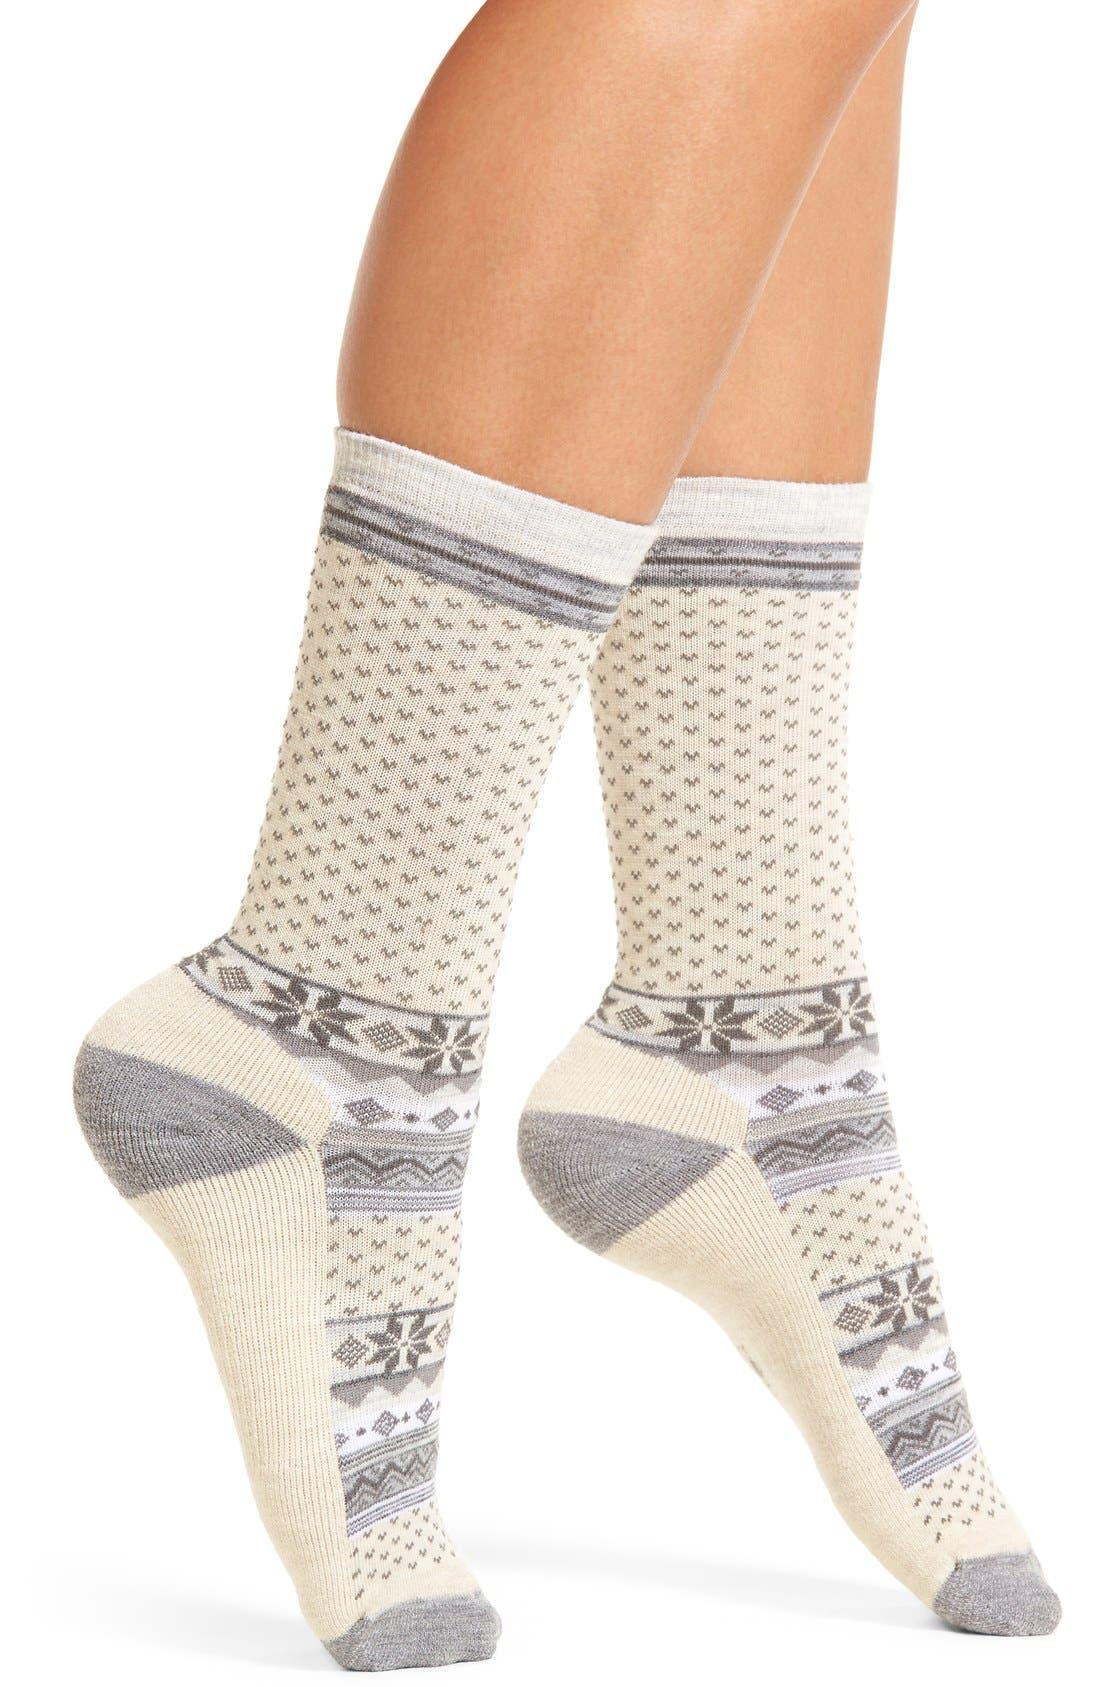 Smartwool 'Cozy Cabin' Crew Socks